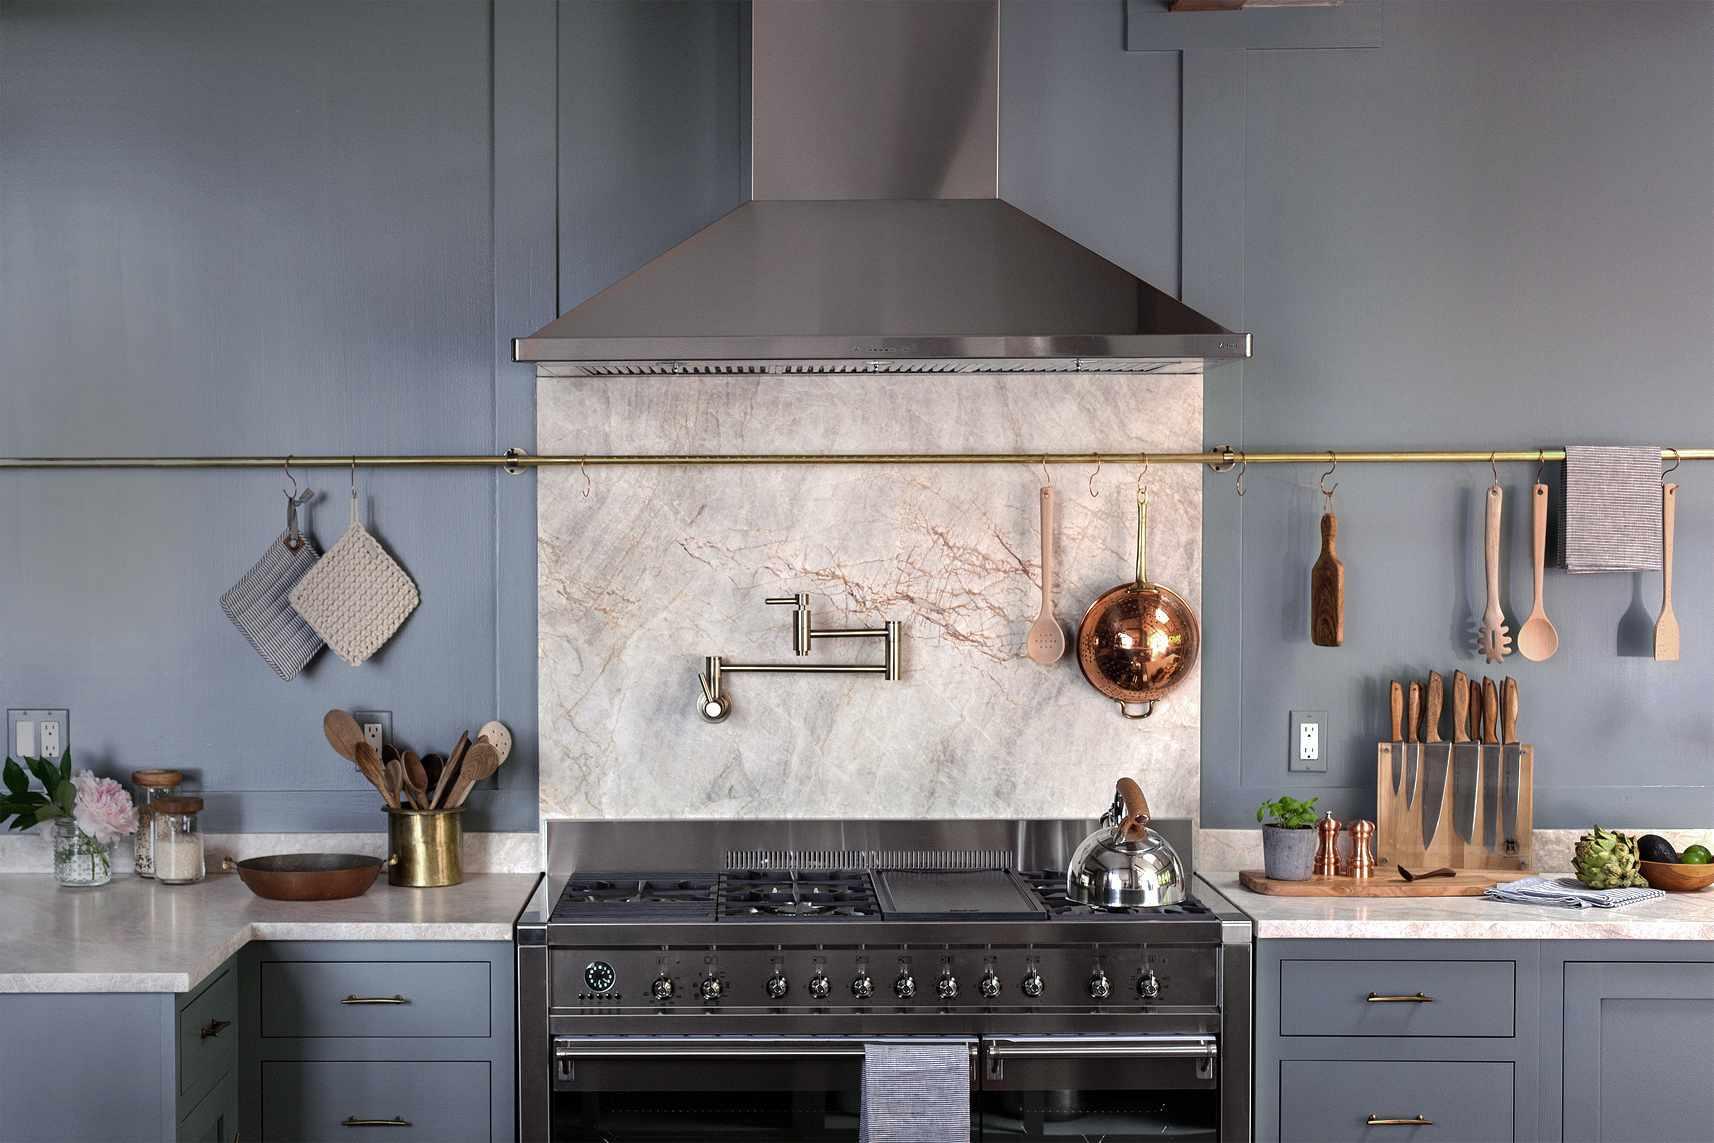 Marble backsplash in a blue gray kitchen